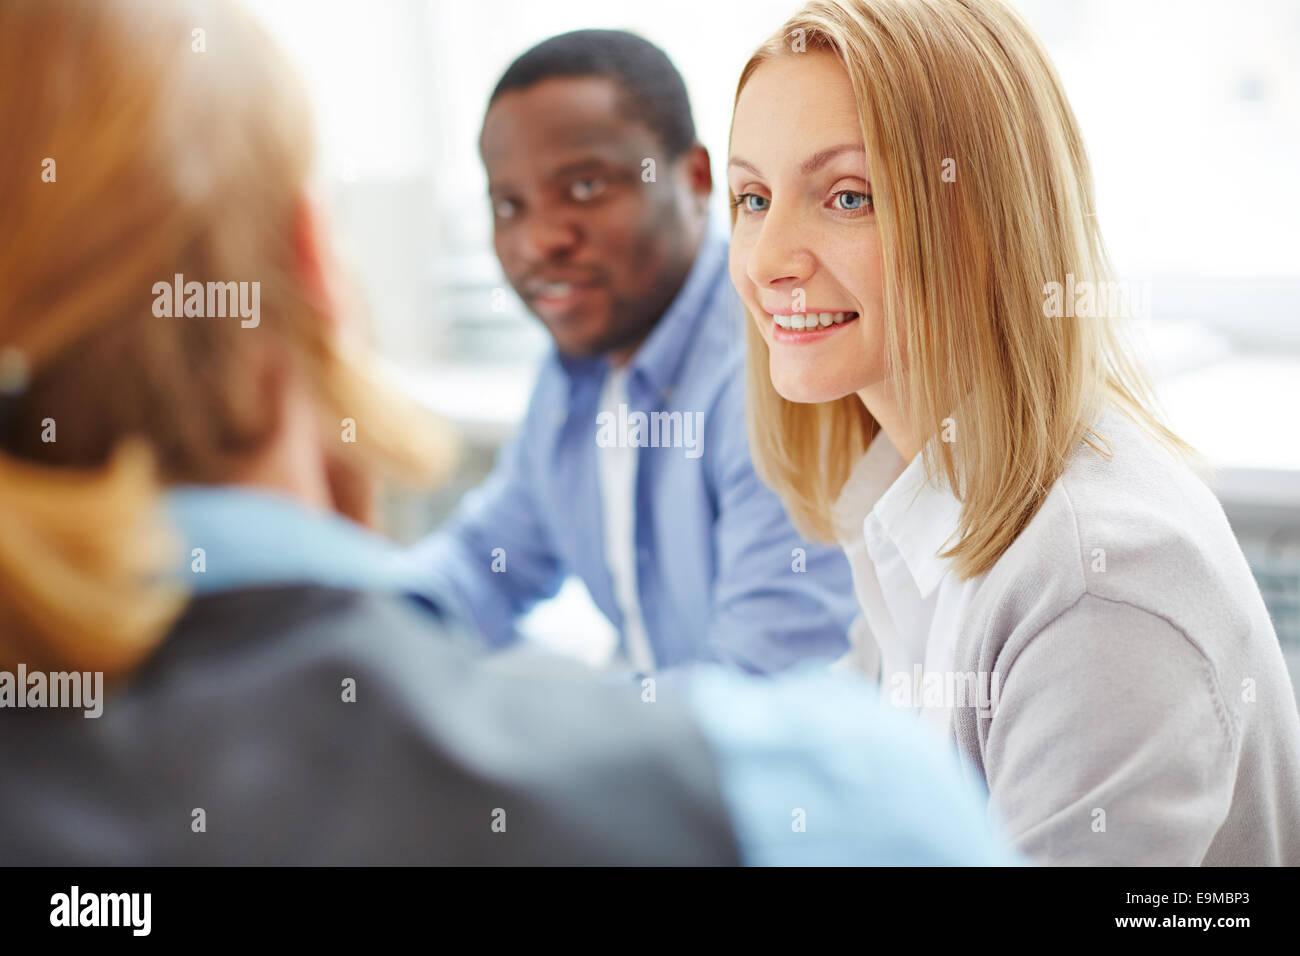 Smiling businesswoman between her co-workers - Stock Image